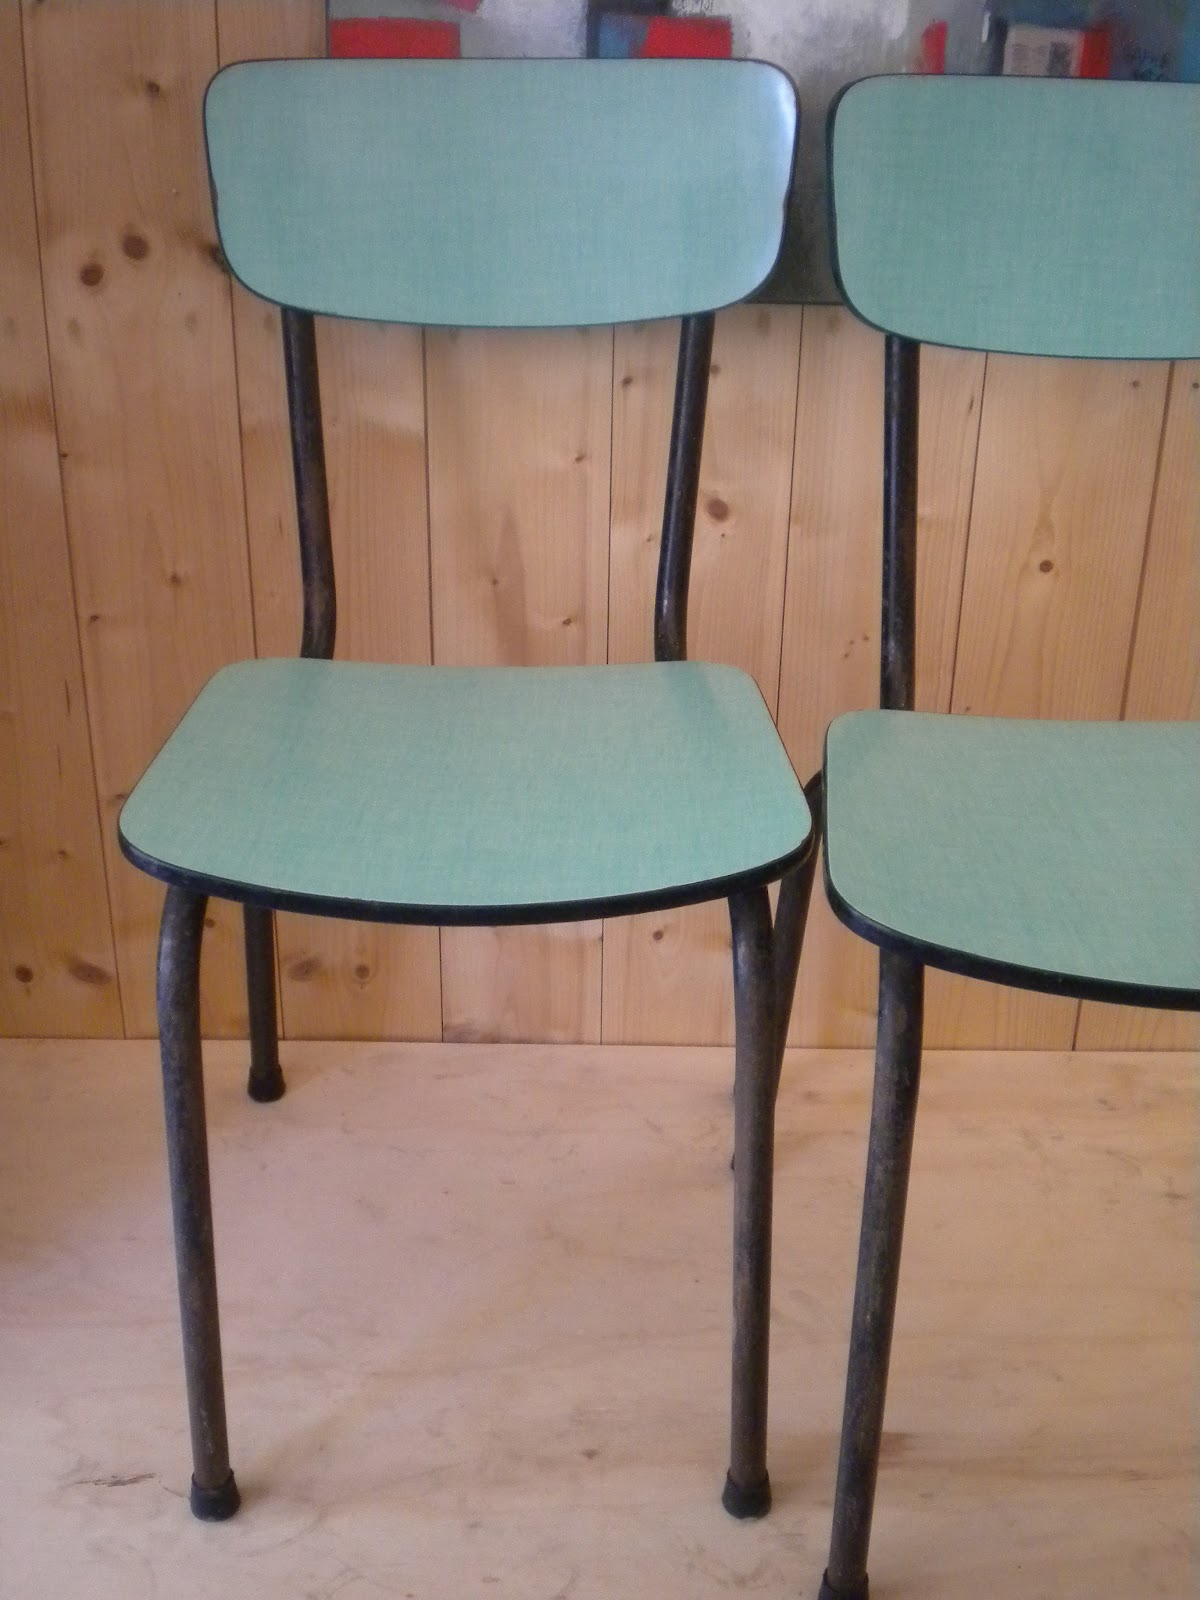 retroverso sieges chaise en formica. Black Bedroom Furniture Sets. Home Design Ideas